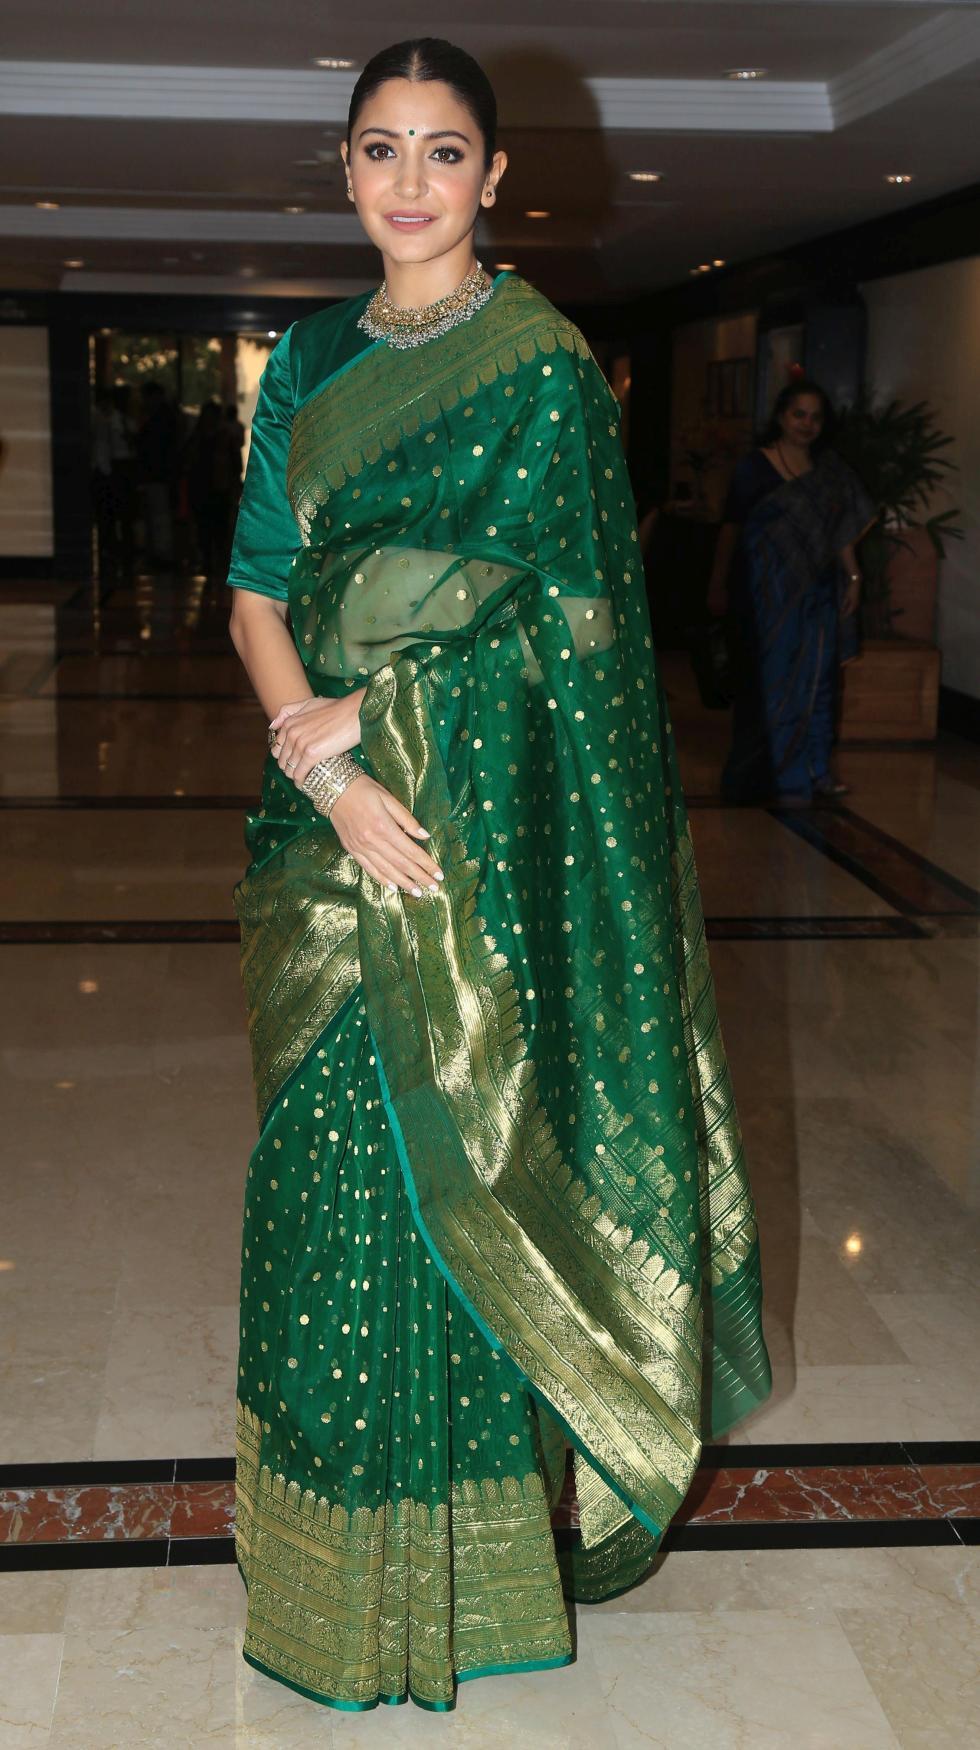 hpse_fullsize_35610_3101143009_Anushka Sharma At Priyadarshani Awards At Triden Hotel , Nariman Point on 19th Sept 2018 (6)_5ba34616660a1.jpg